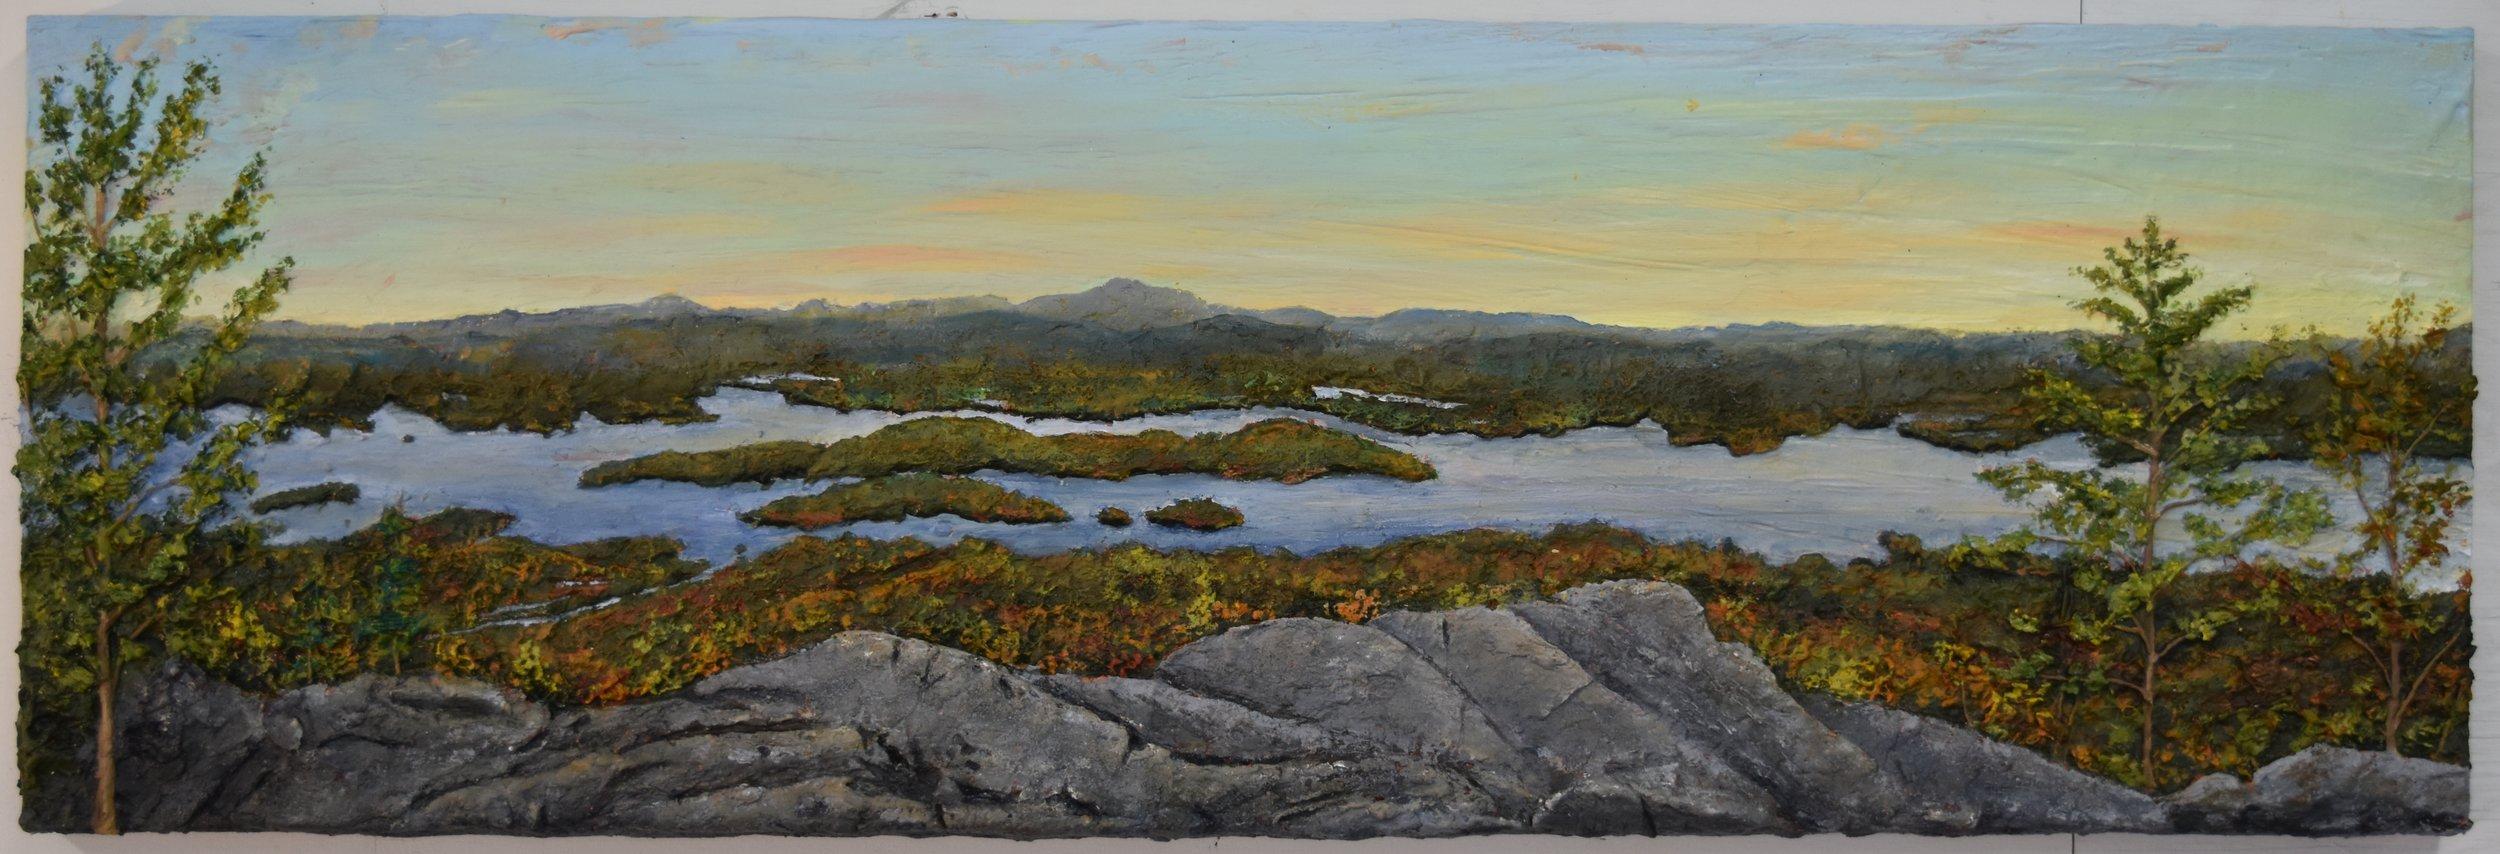 View of Lake Winnipesaukee from Mt. Major